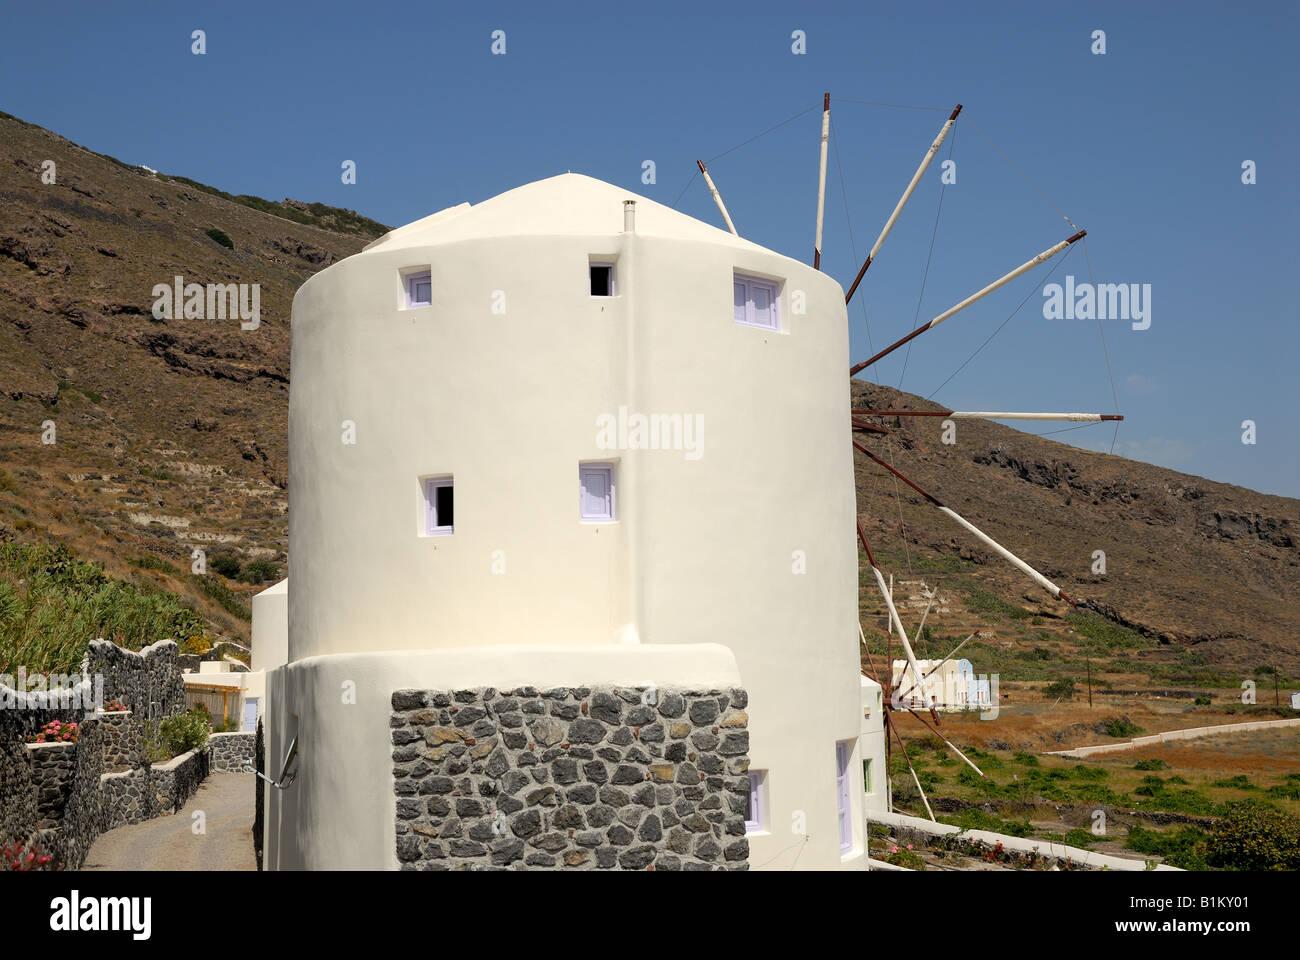 modern windmill stock photos amp modern windmill stock